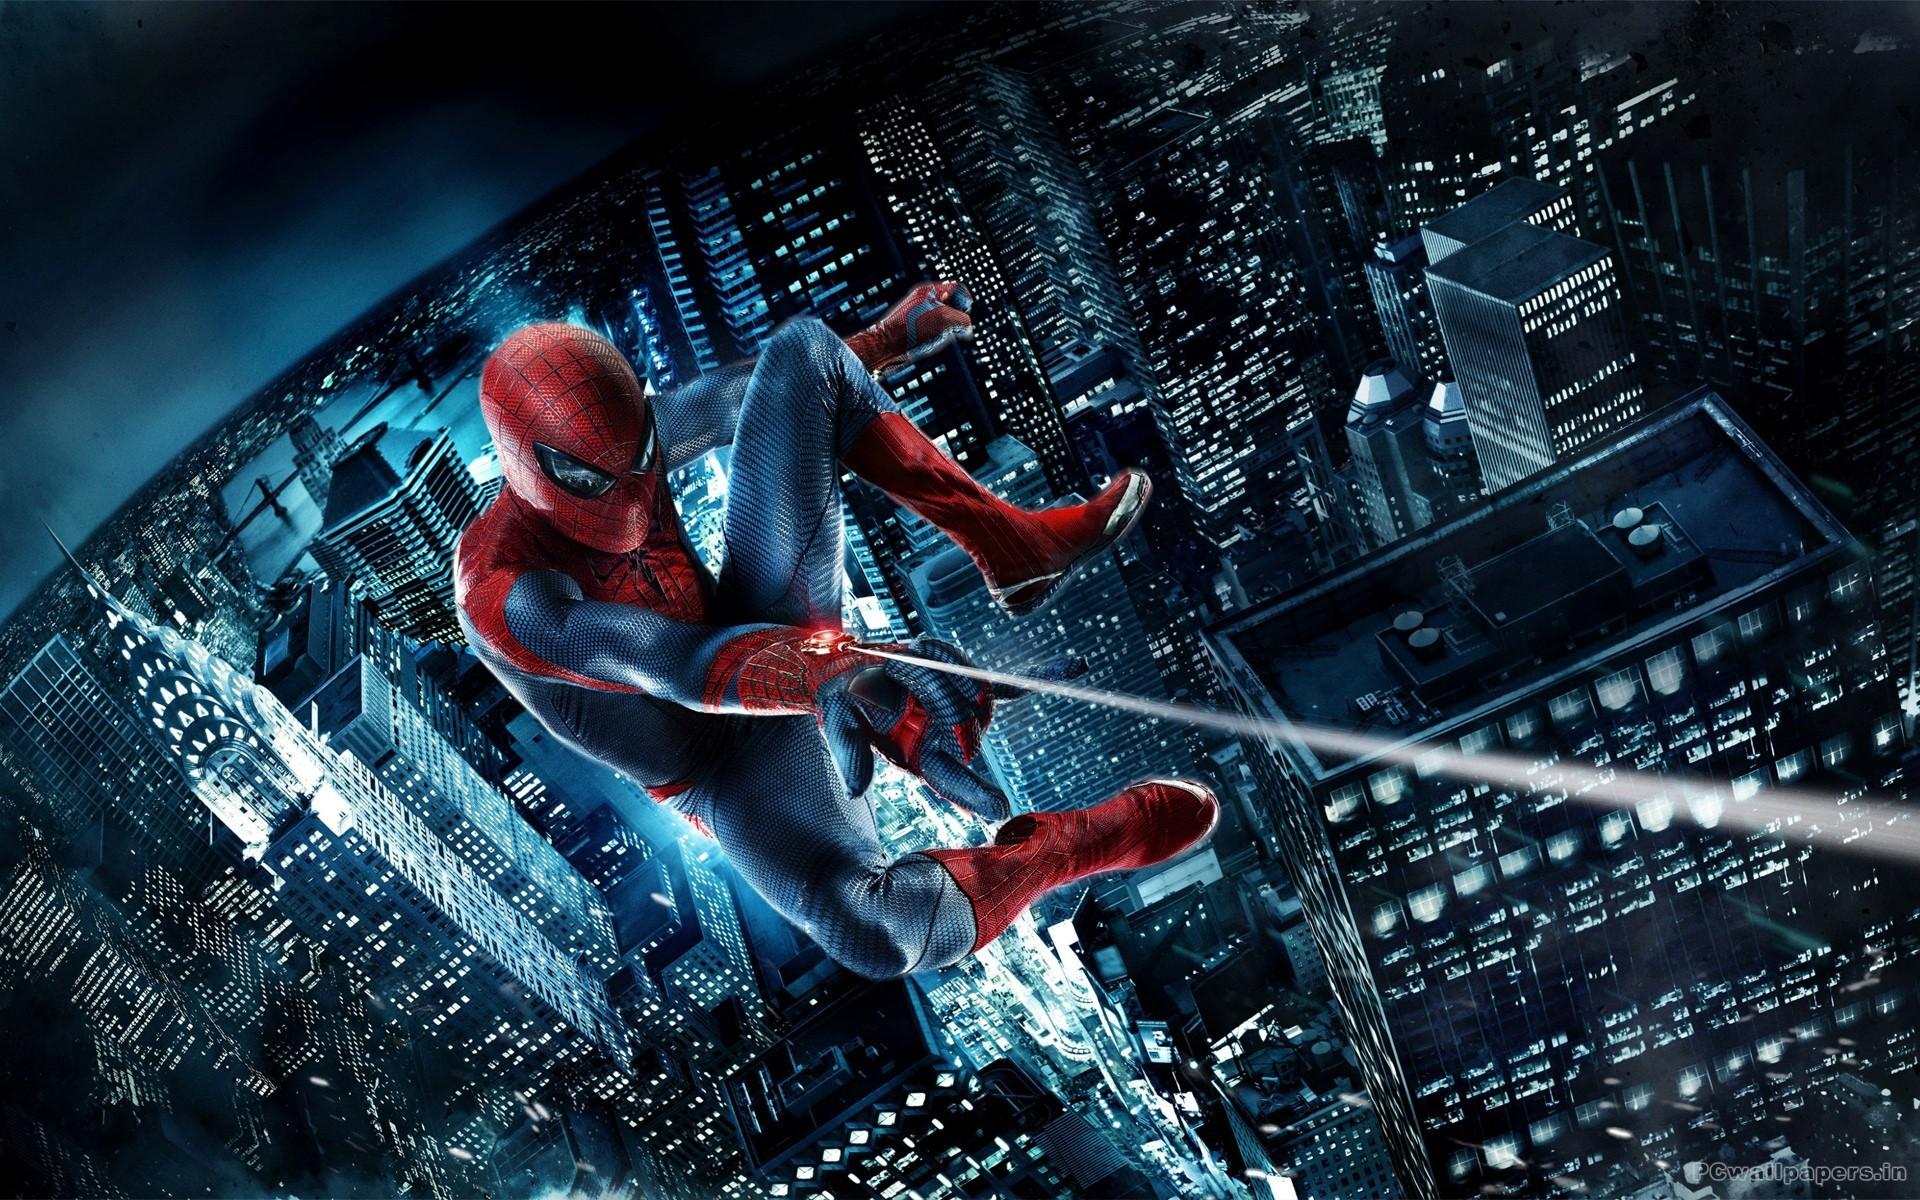 Spiderman Wallpaper 4 – MagNyus Theme Wallpaper : MagNyus Theme .